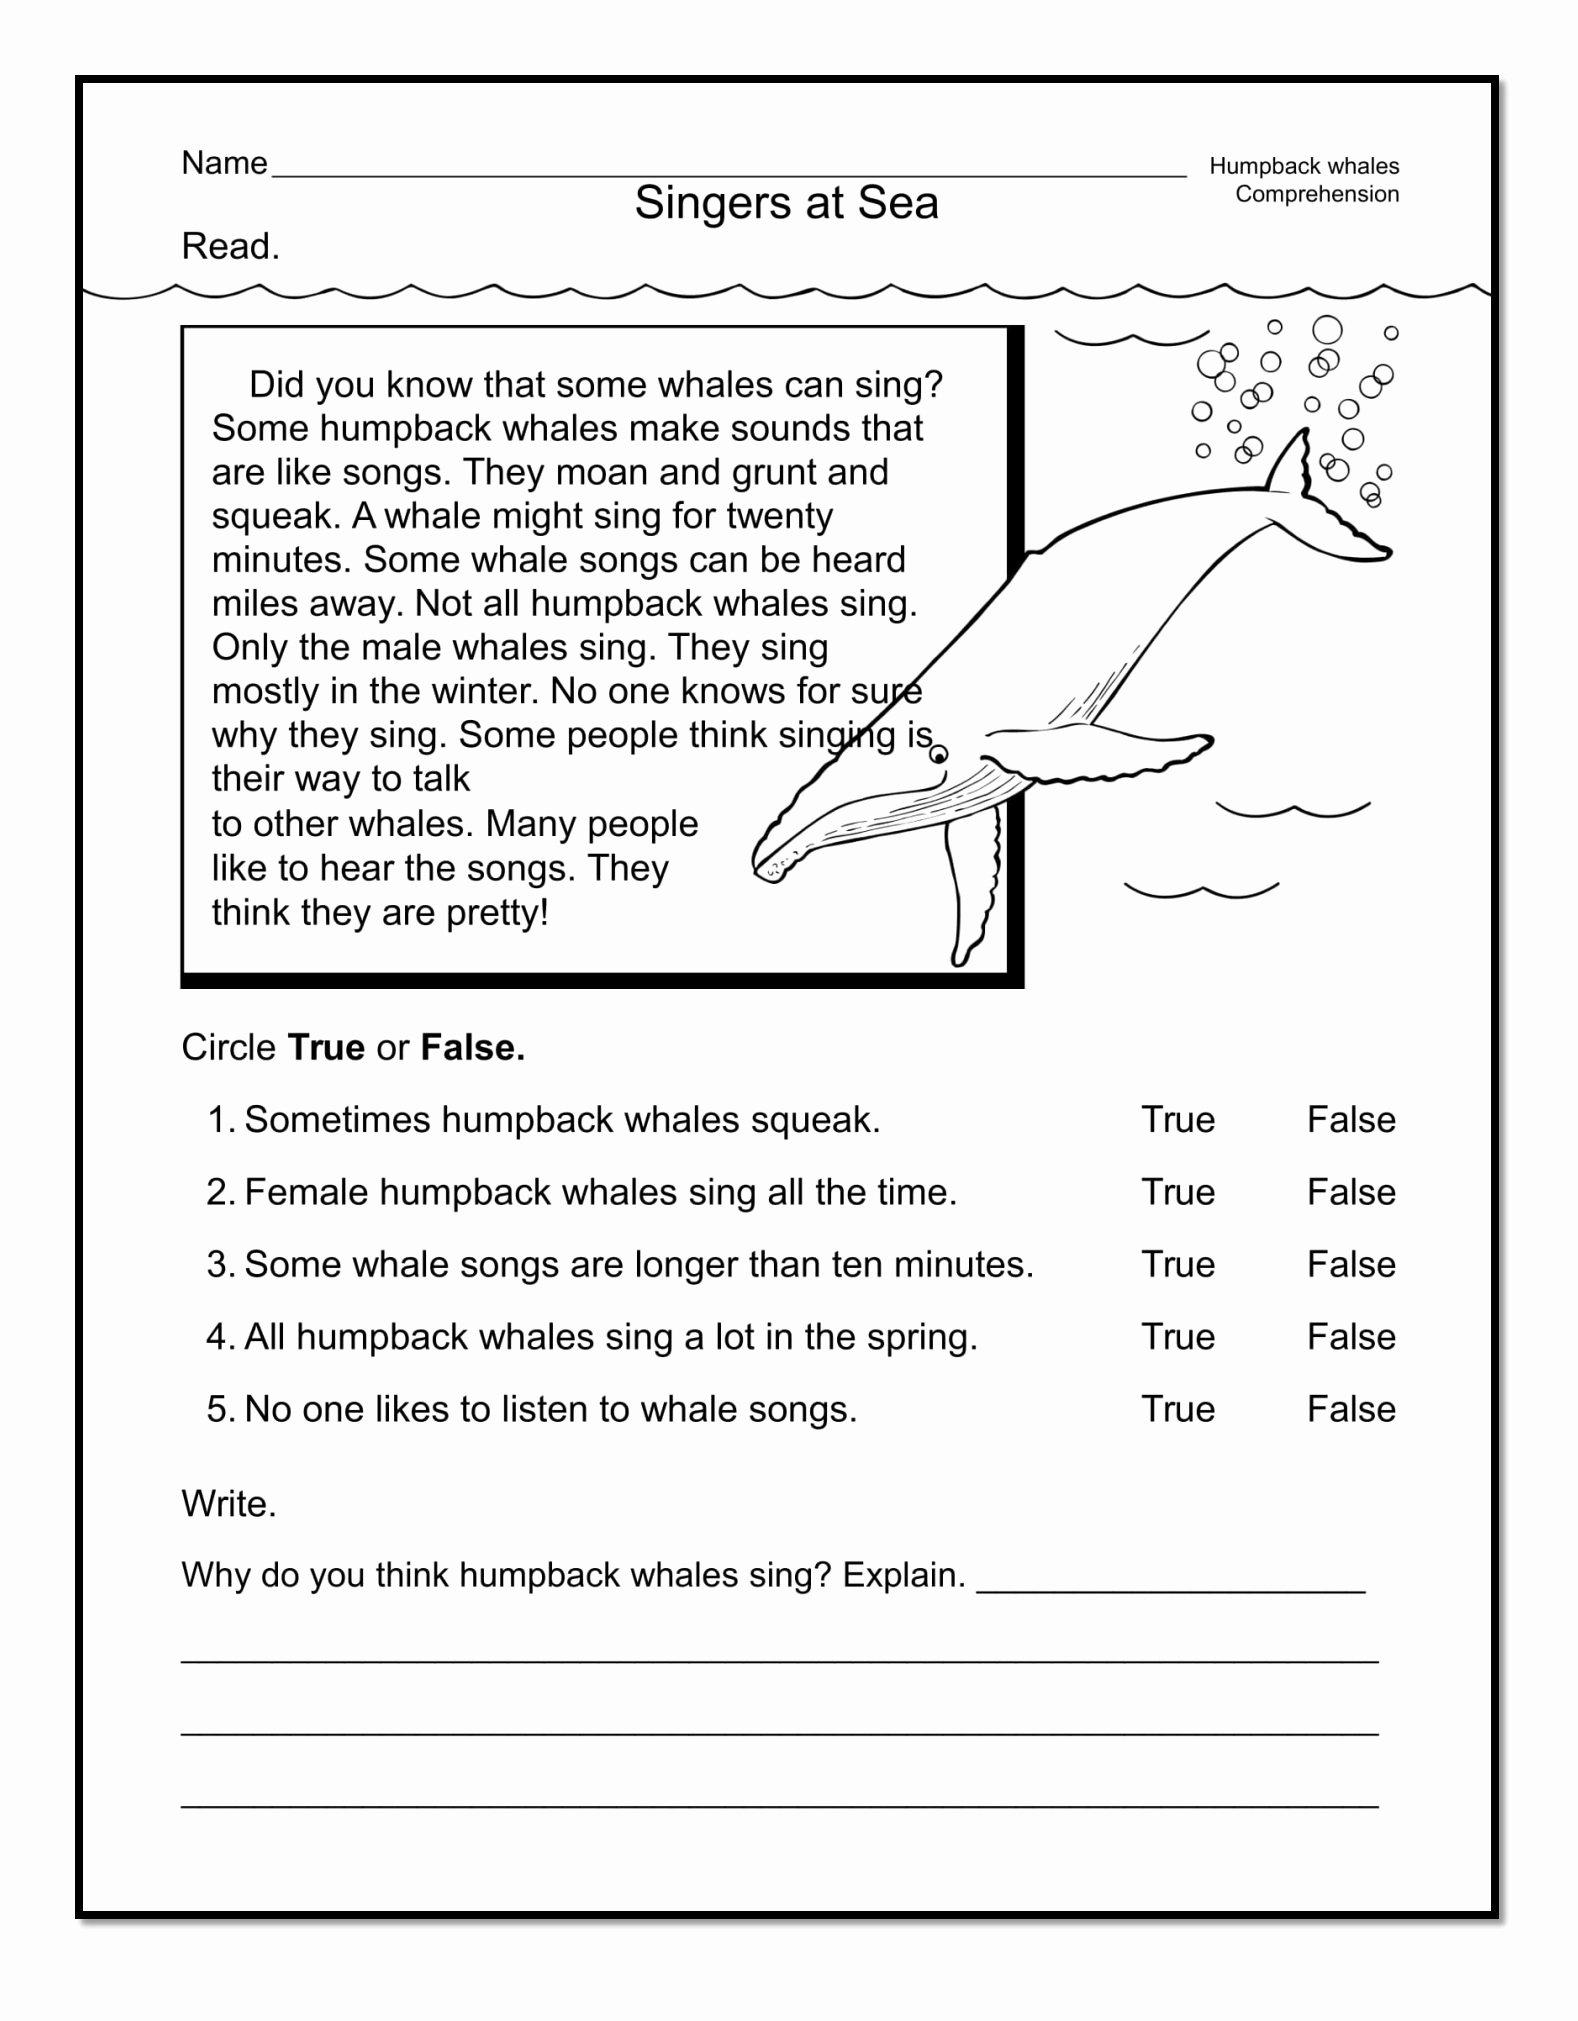 Free 1st Grade Comprehension Worksheets New Good Examples 1st Grade Worksheets Free Download